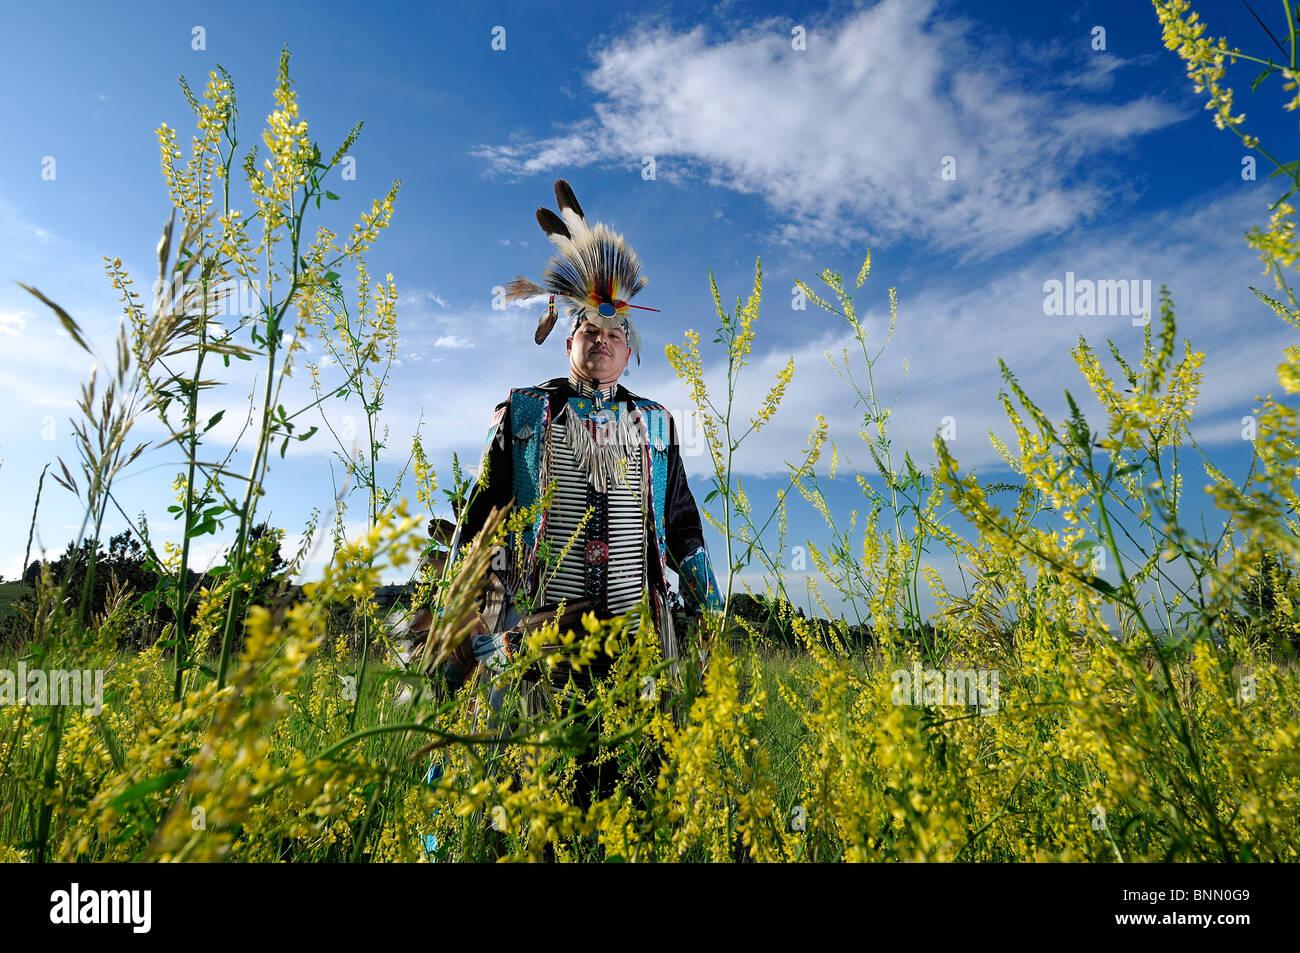 Traditional Dancer Stephen Yellow Hawk Native American Indian Rapid City South Dakota USA costume - Stock Image